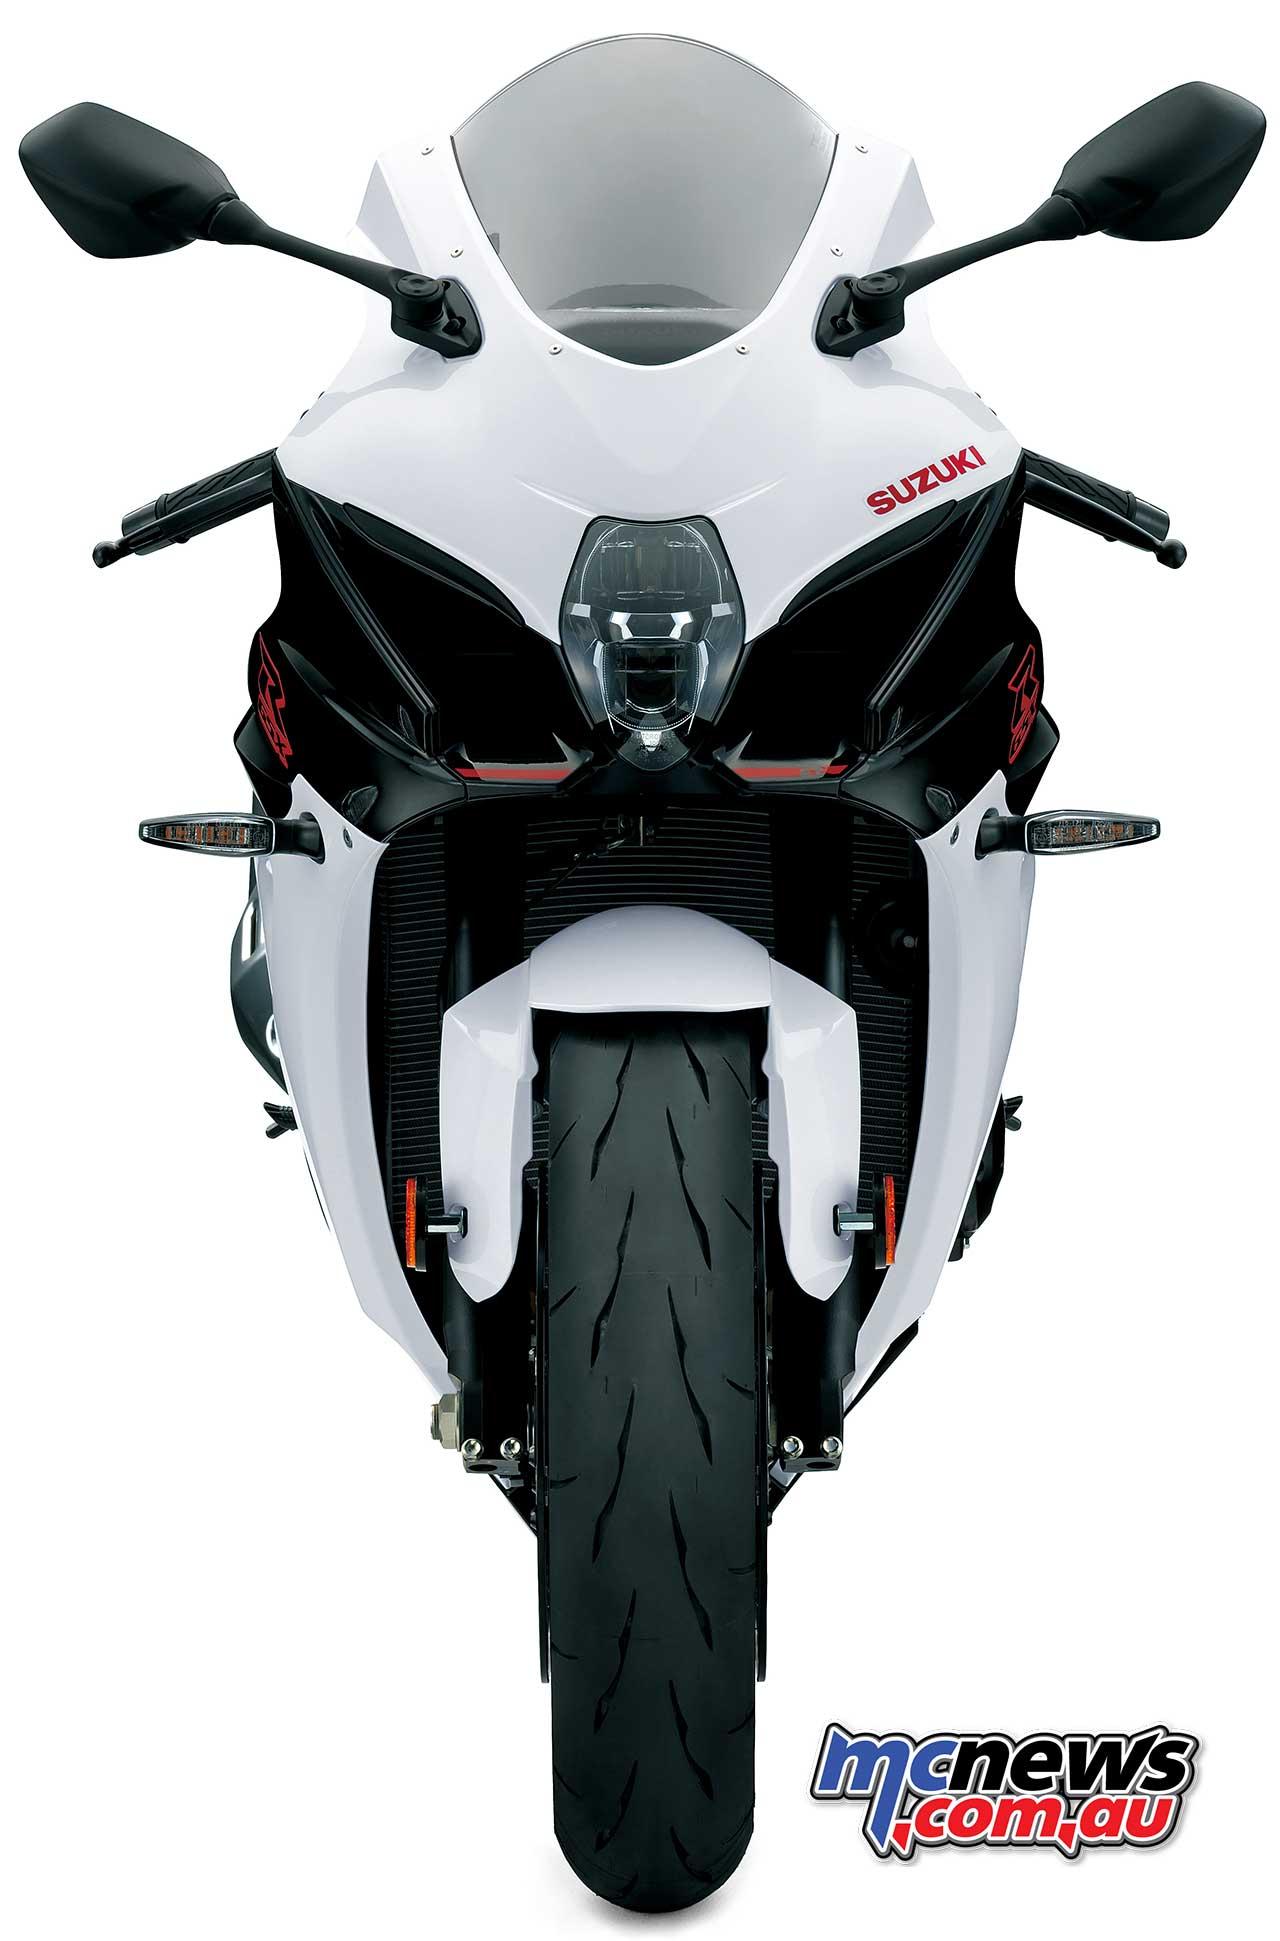 2019 Suzuki Gsx R1000r And Gsx R1000 Minor Tweaks Mcnews Com Au